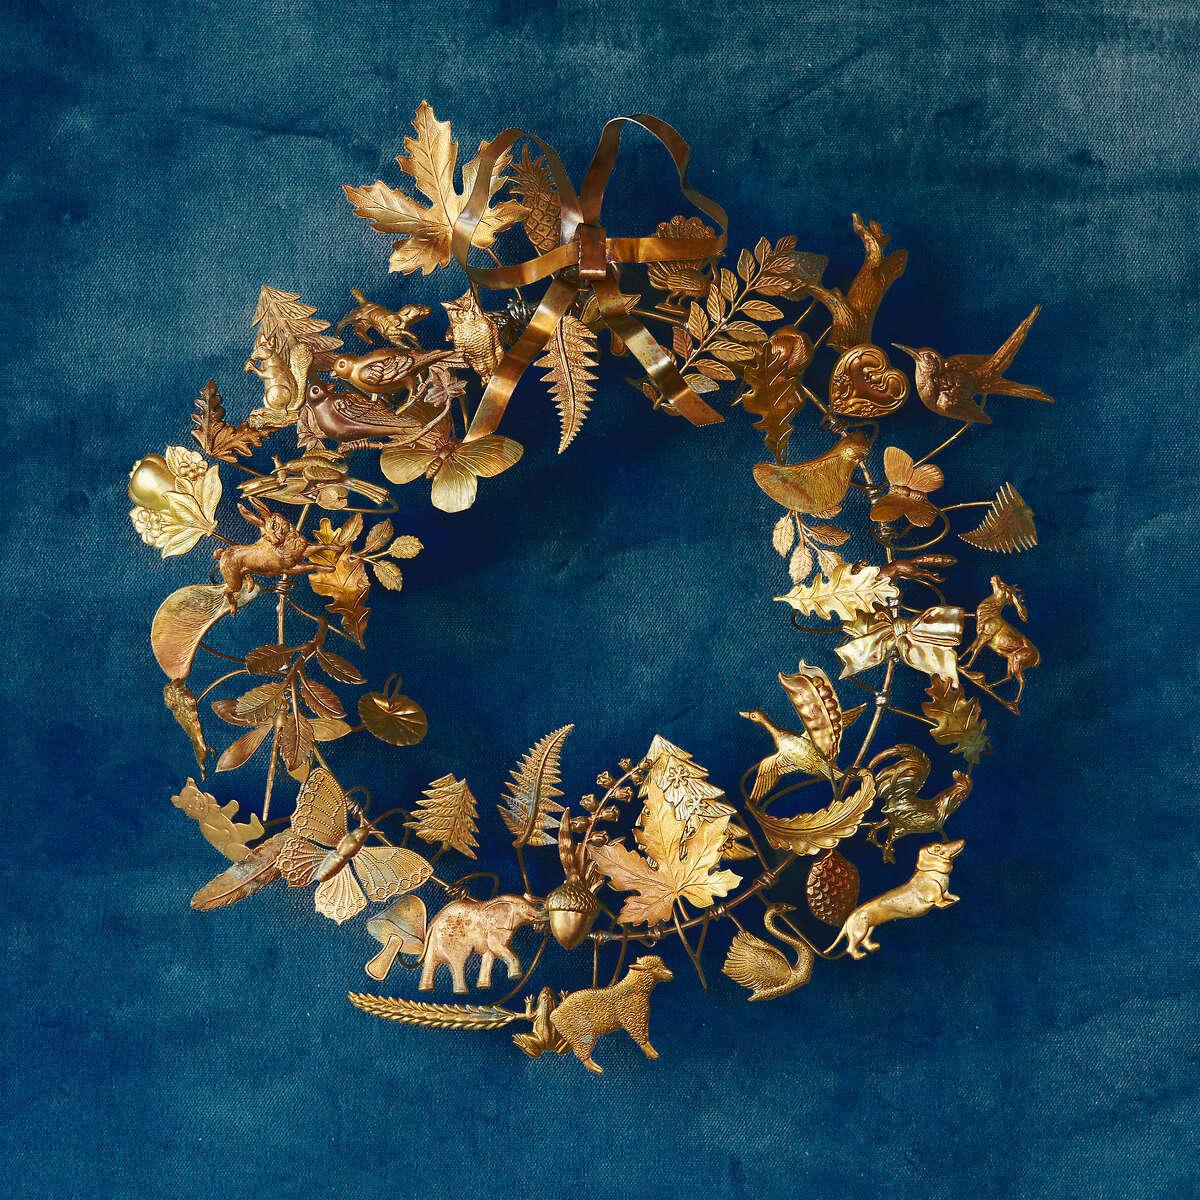 Dresden Ornament Wreath, shopterrain.com; $398